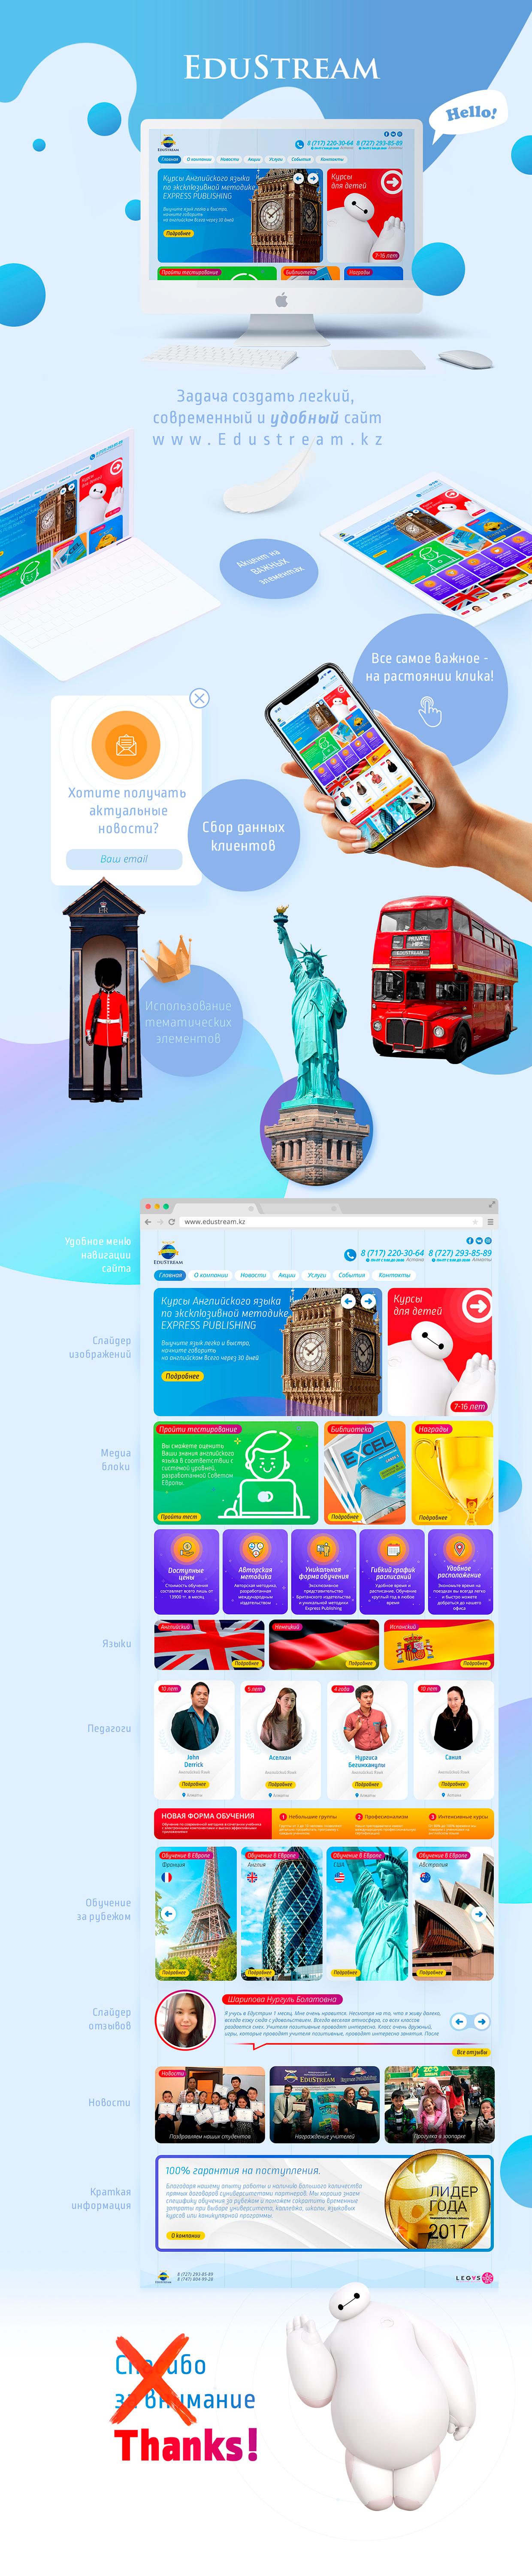 Дизайн и разработка корпоративного сайта EduStream.kz